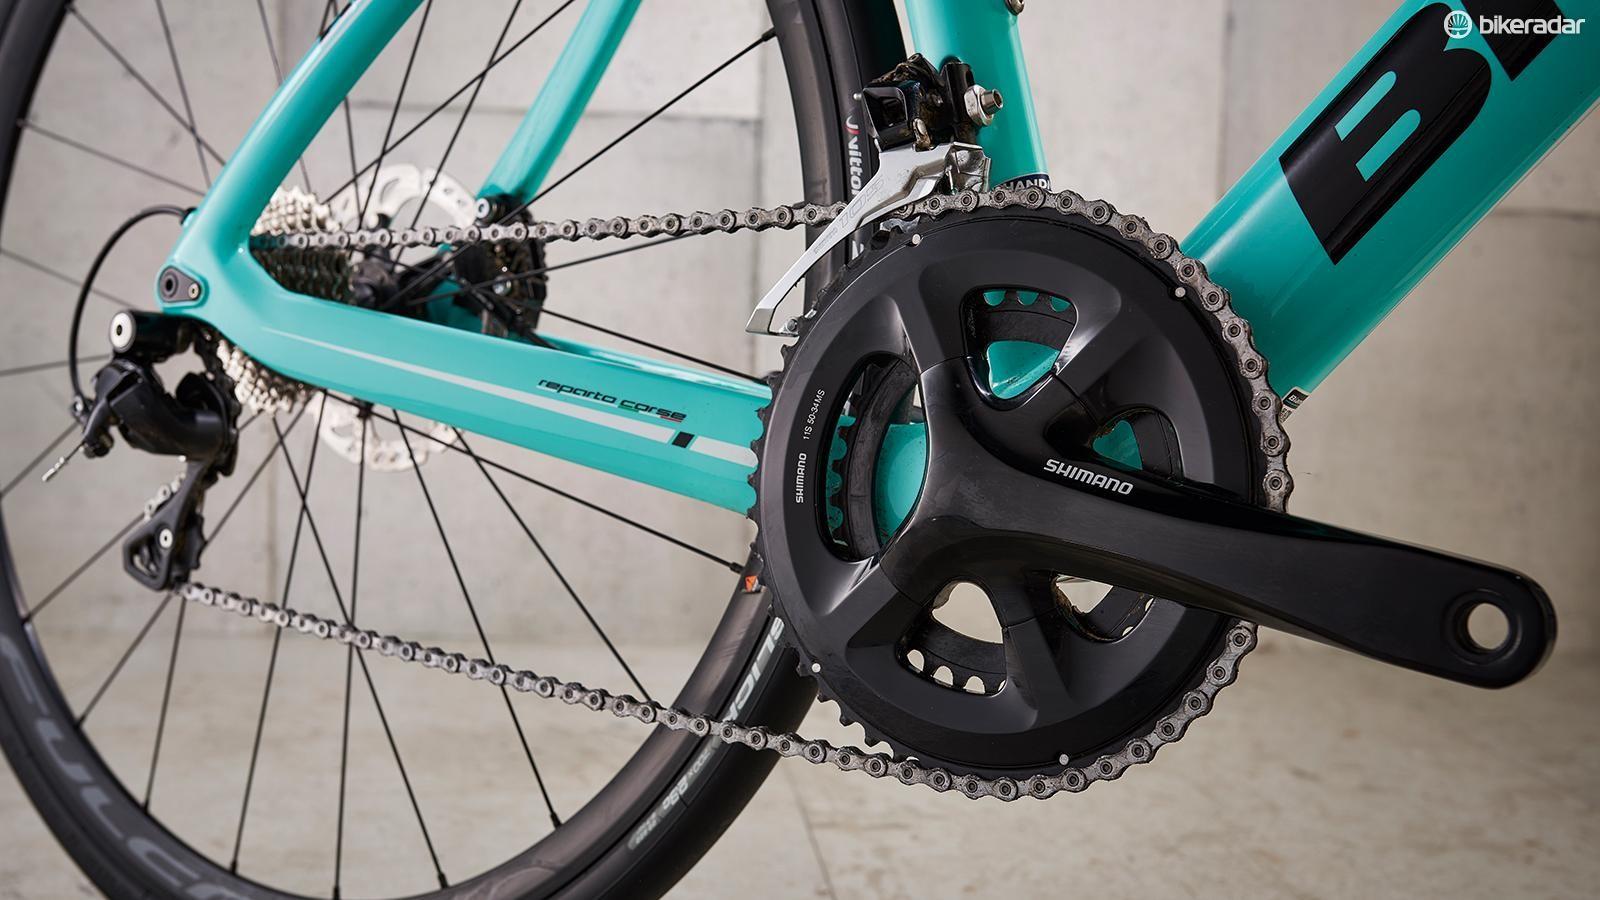 200a7ad36a1 Bianchi Aria Disc 105 Two review - Road Bikes - Bikes - BikeRadar